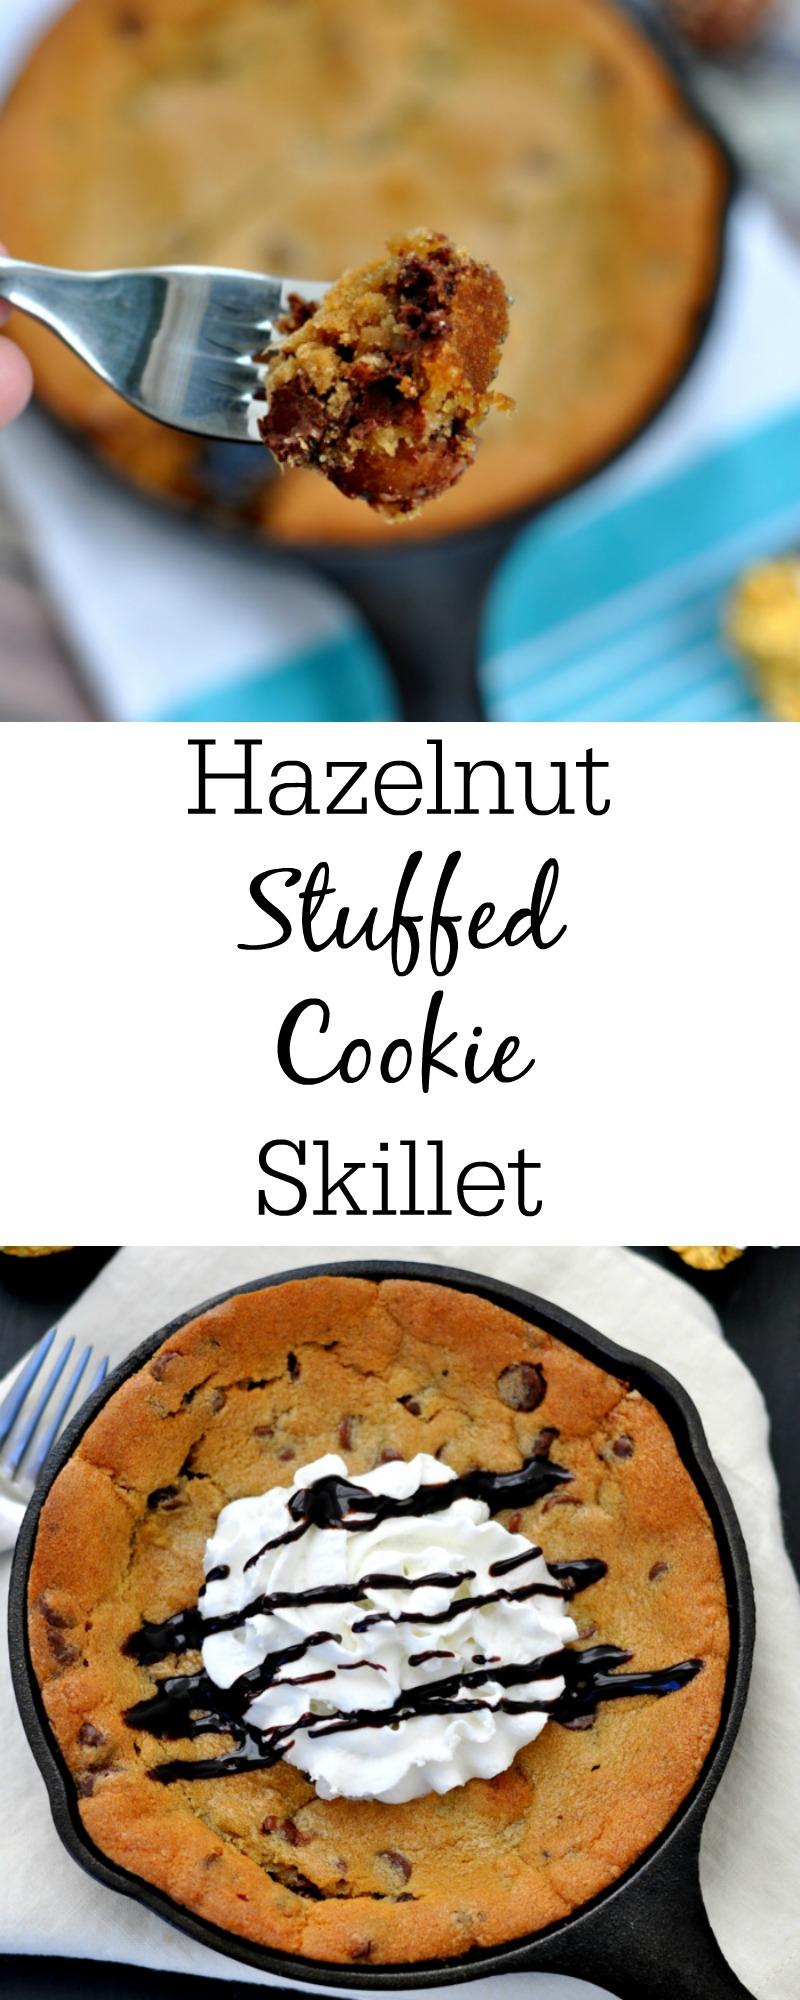 Hazelnut Stuffed Cookie Skillet